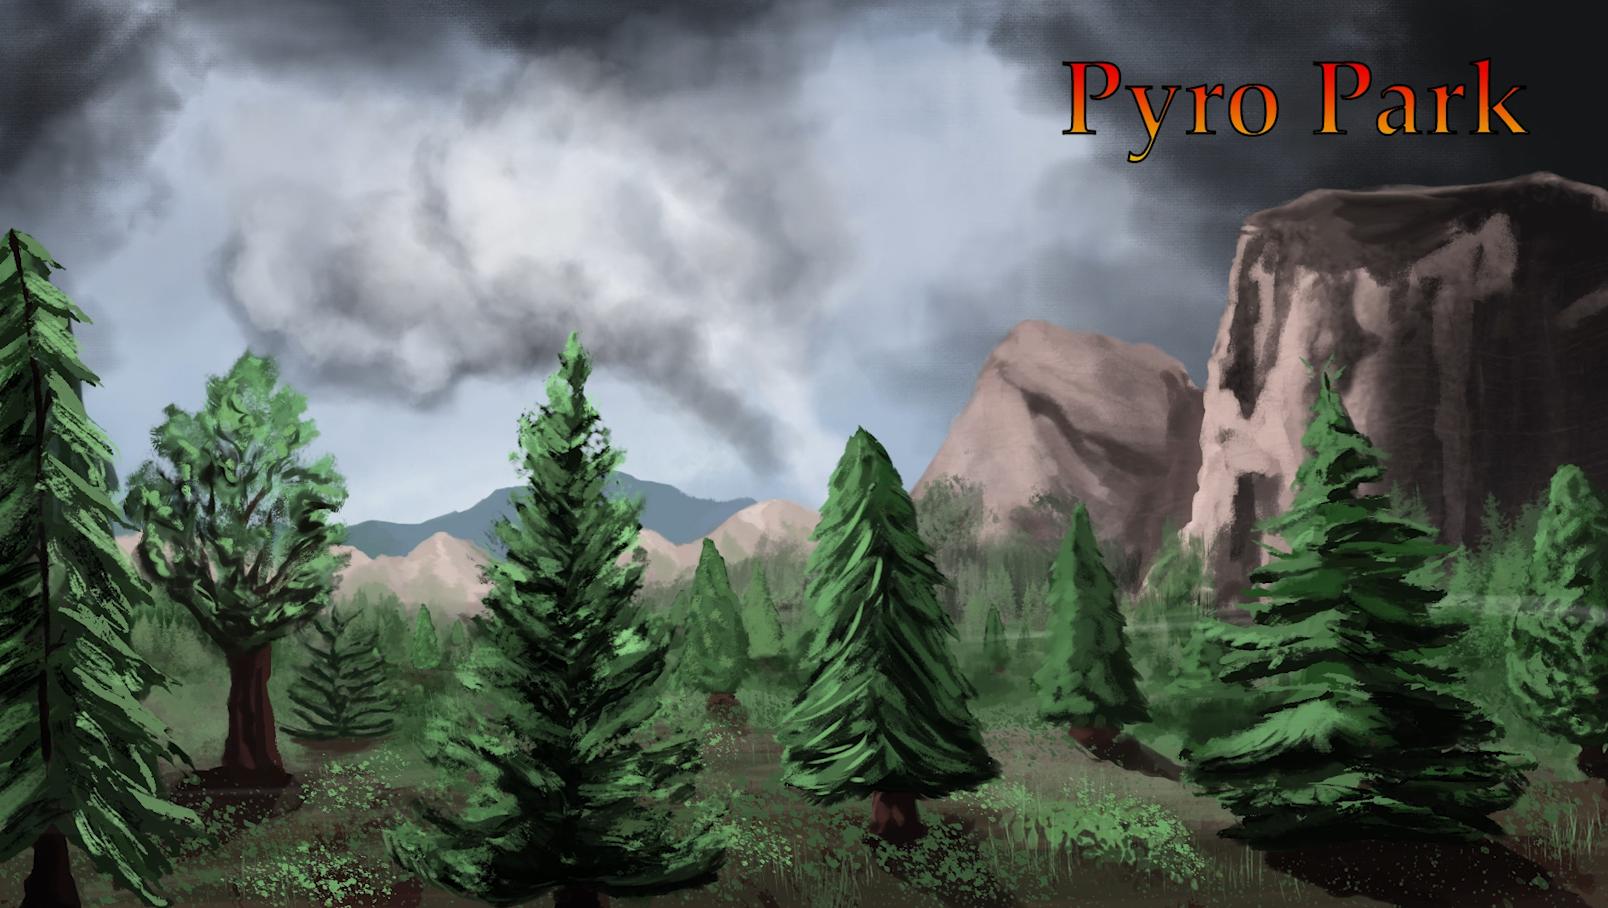 Pyro Park